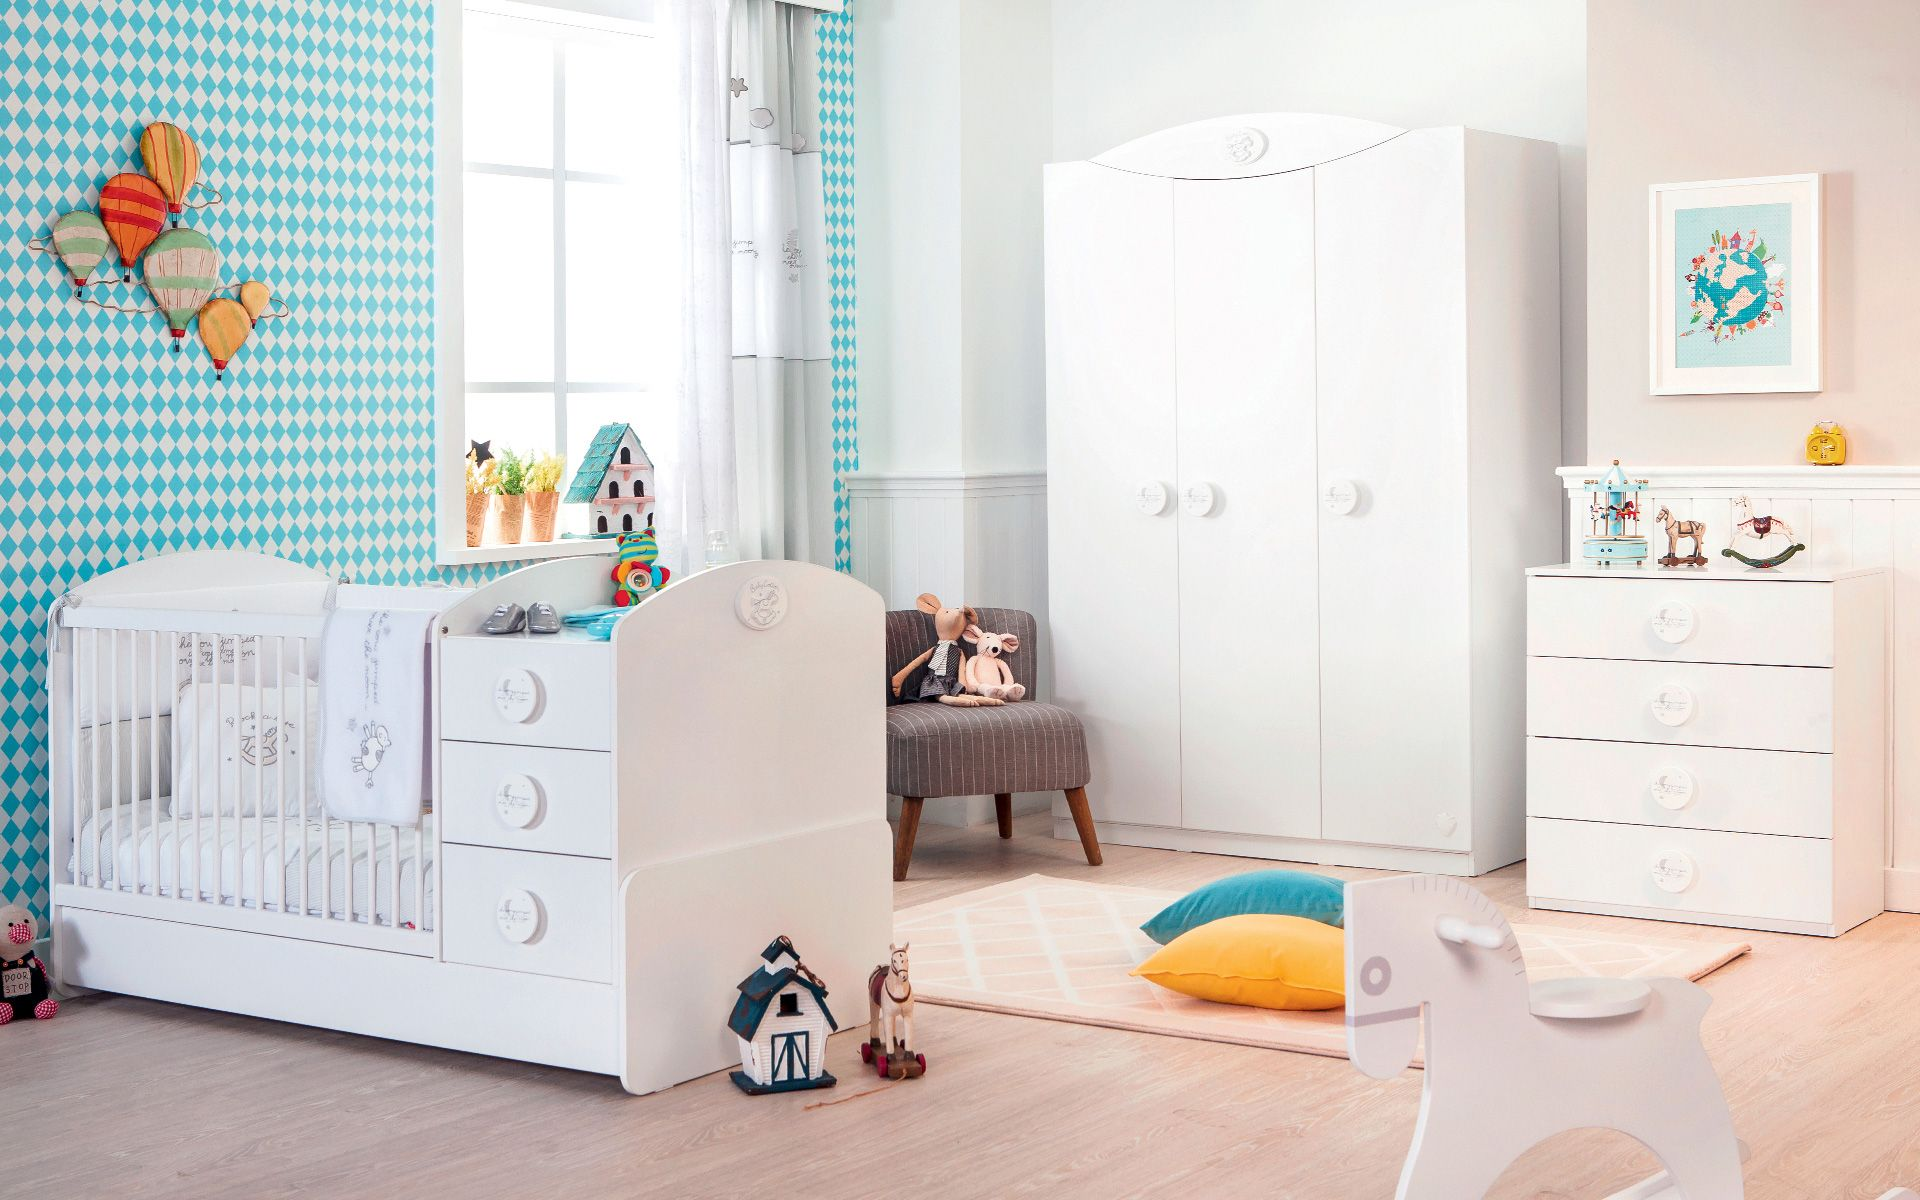 Cotton Baby Wardrobe With 3 Doors Modern Nursery Themes